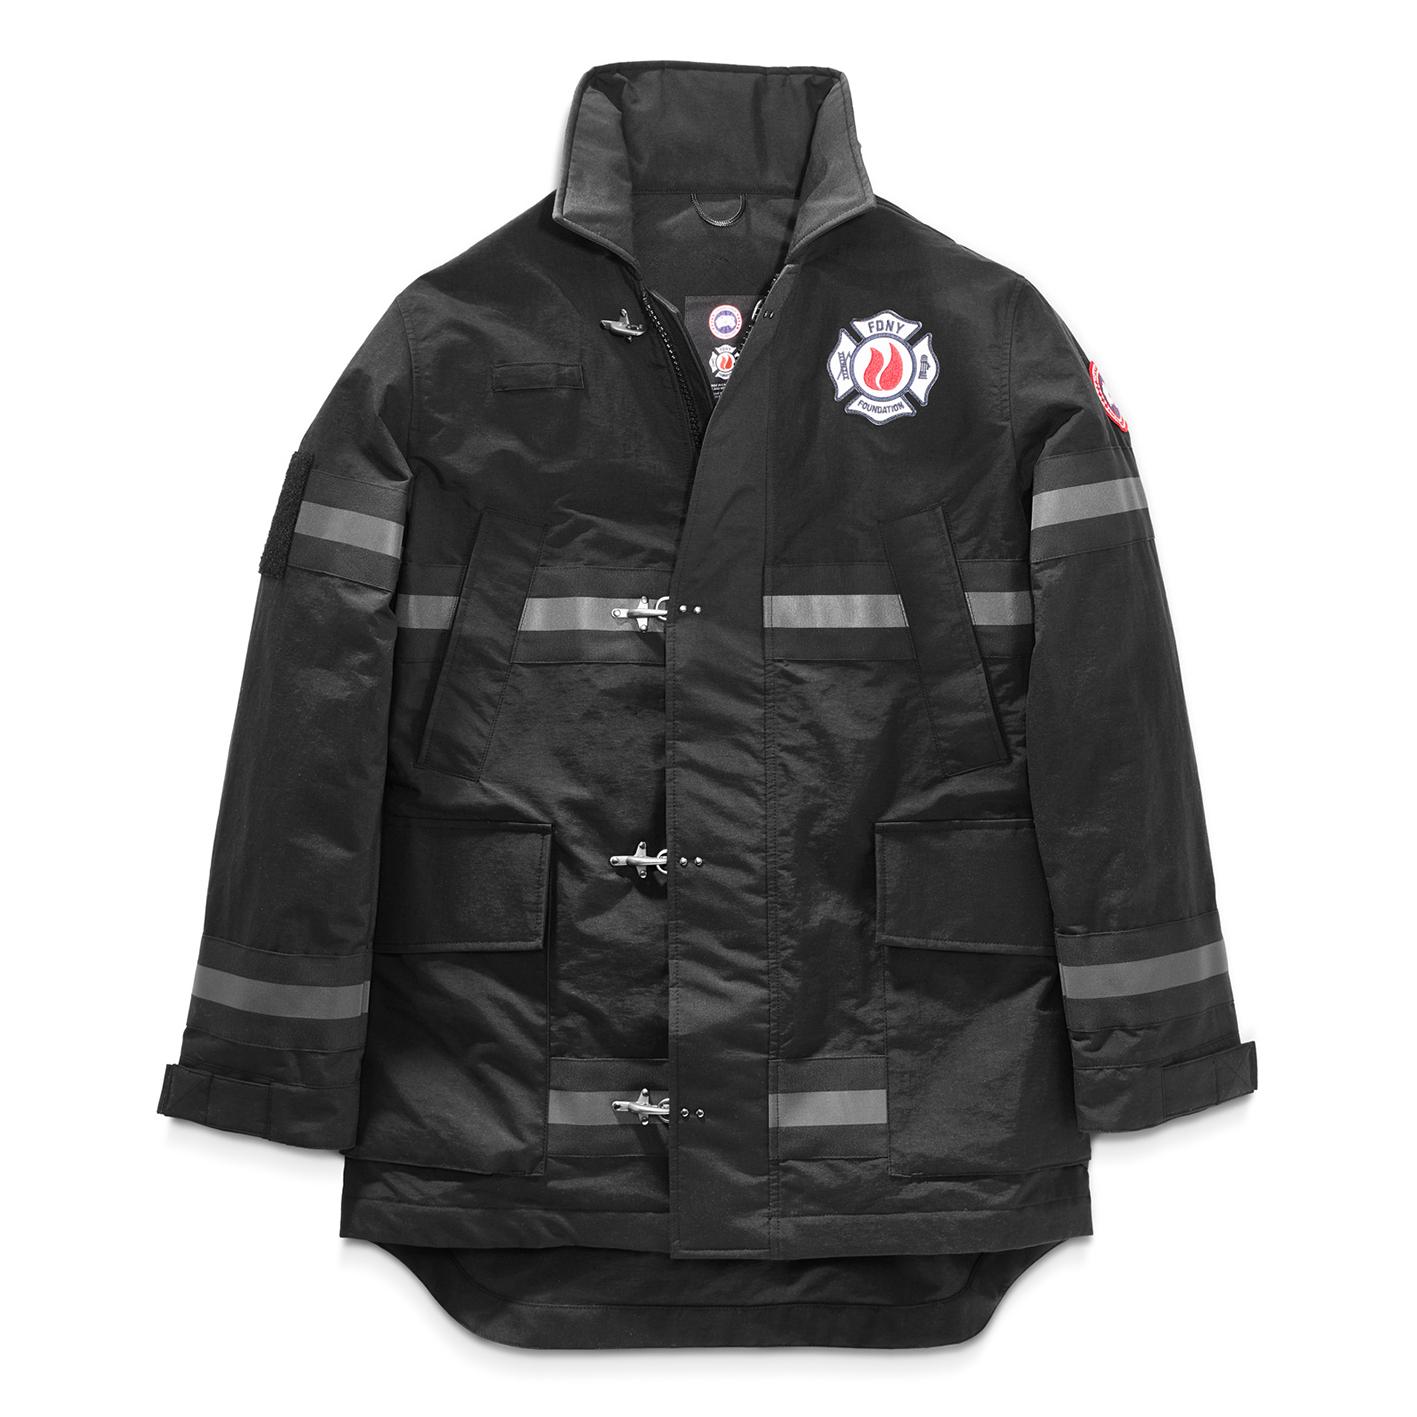 Canada Goose FDNY: The Bravest Coat